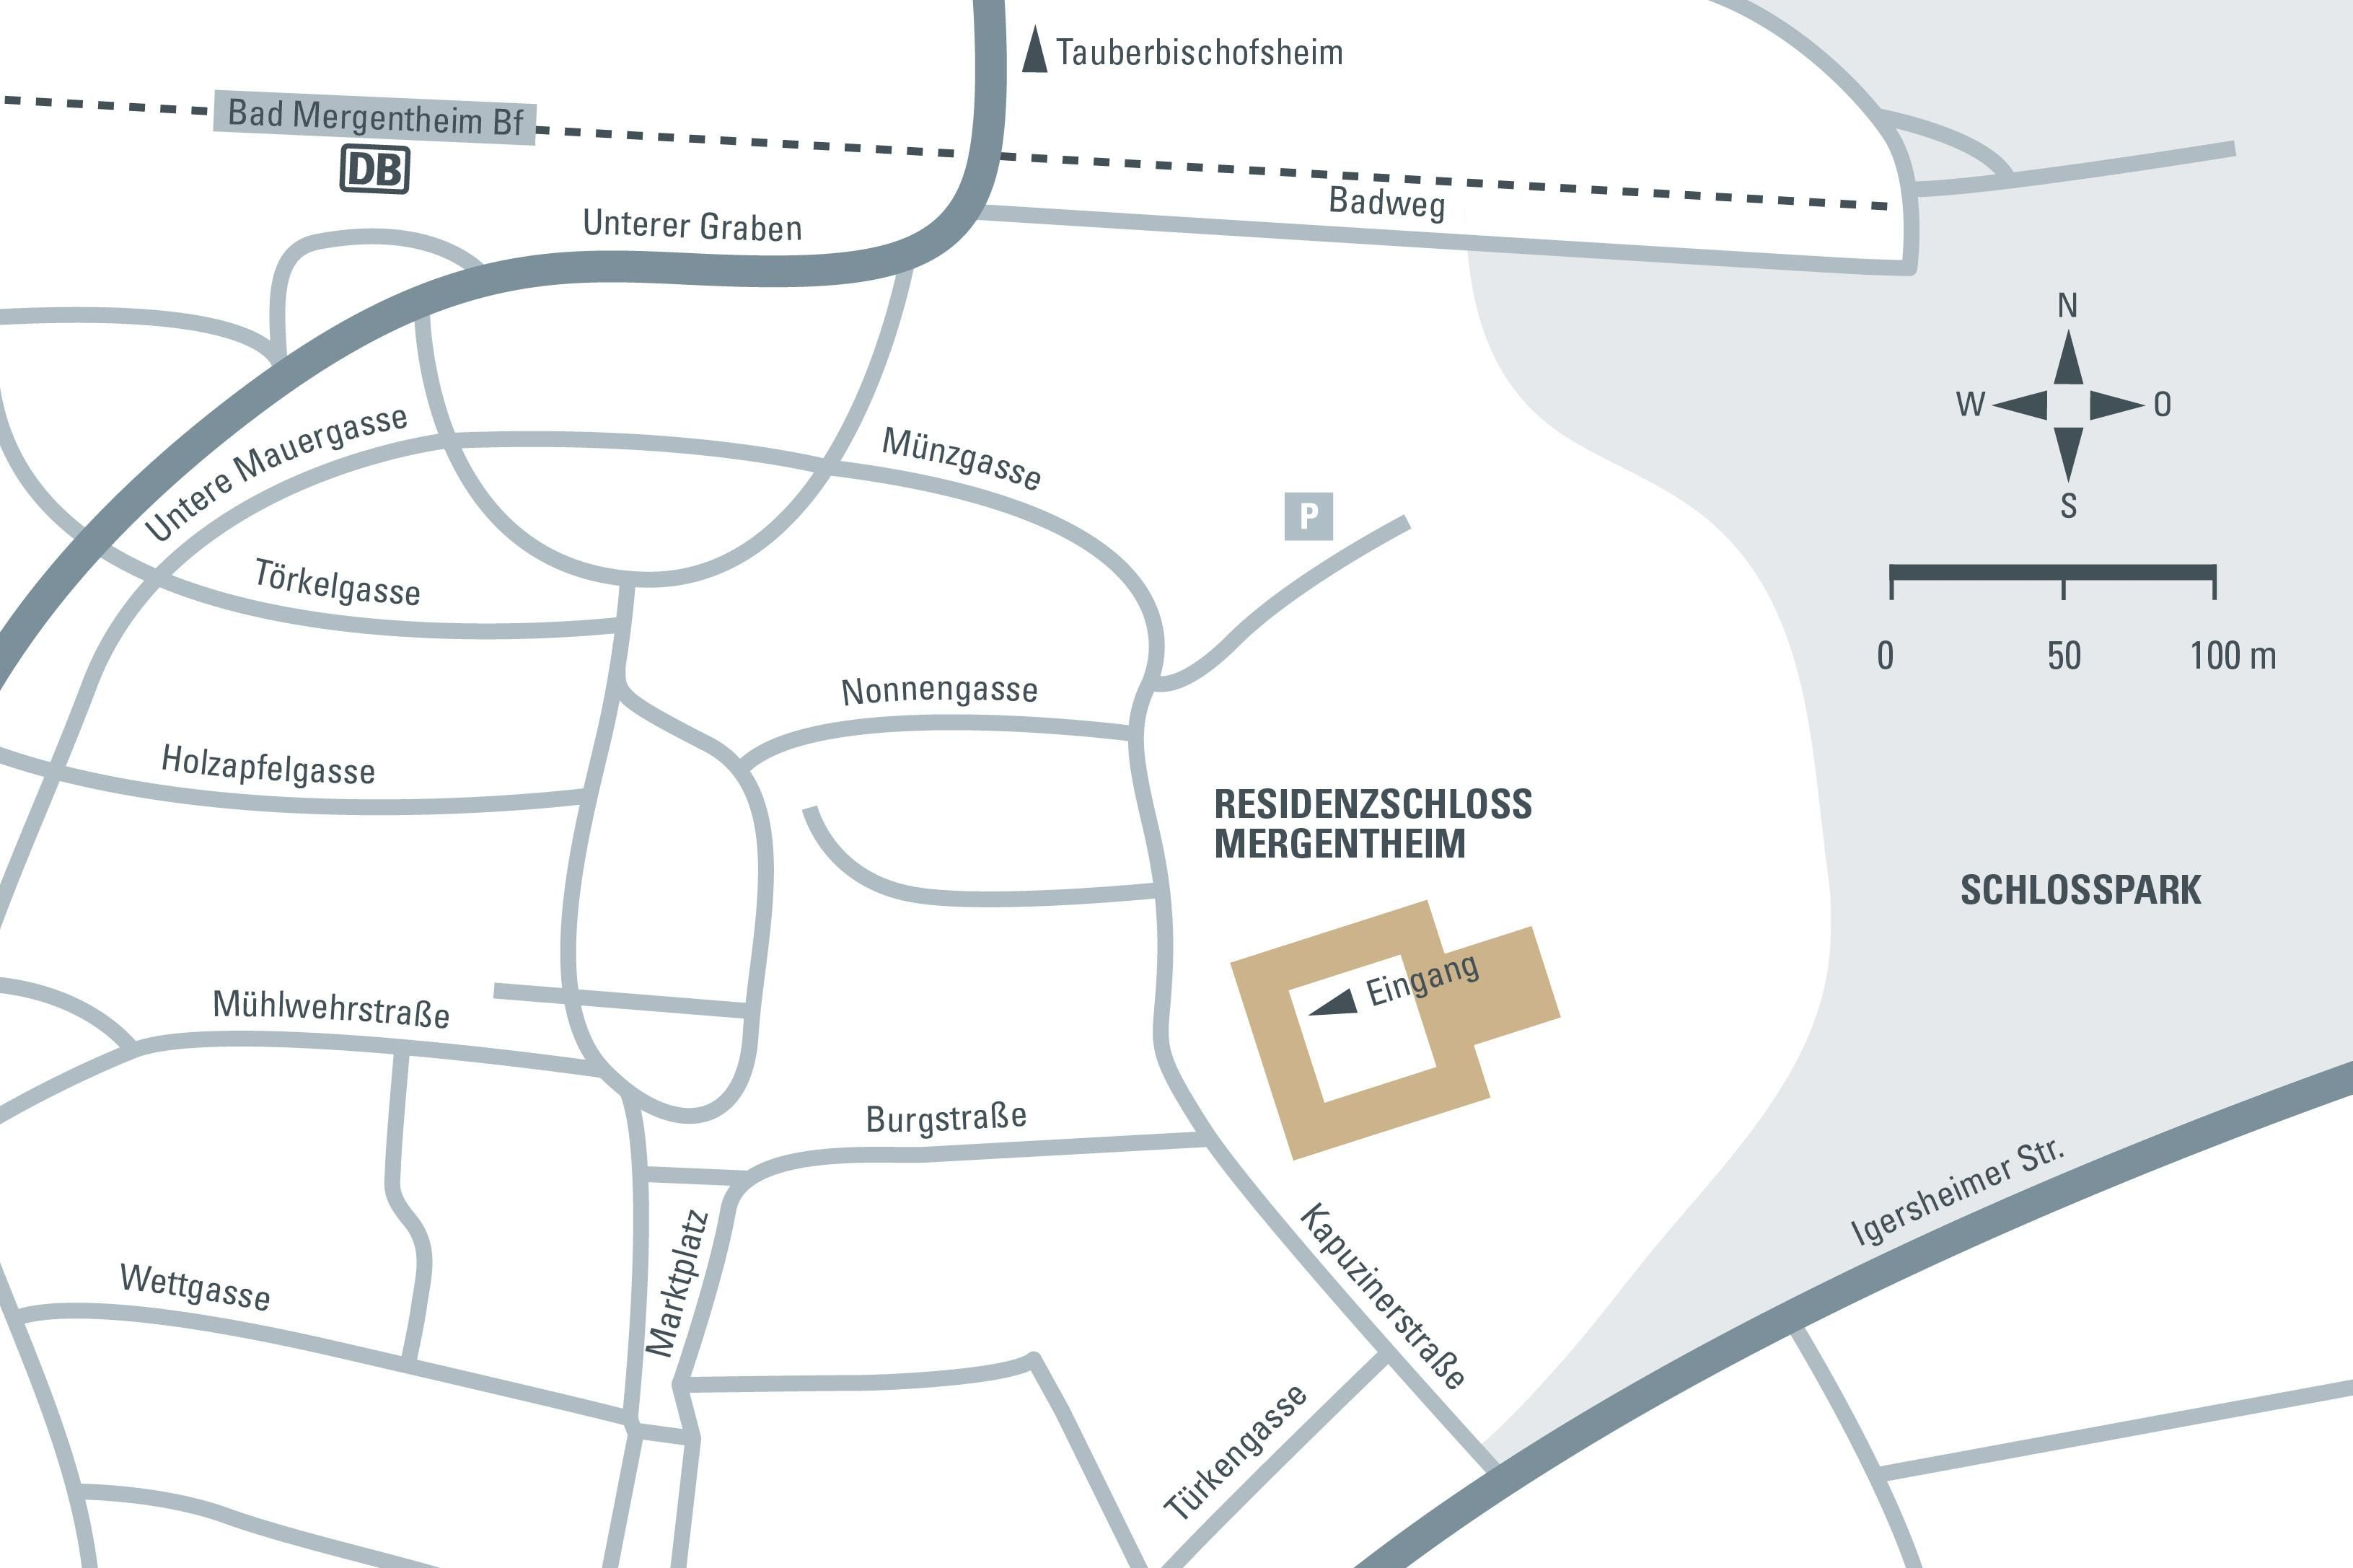 Anfahrtsskizze zum Residenzschloss Mergentheim